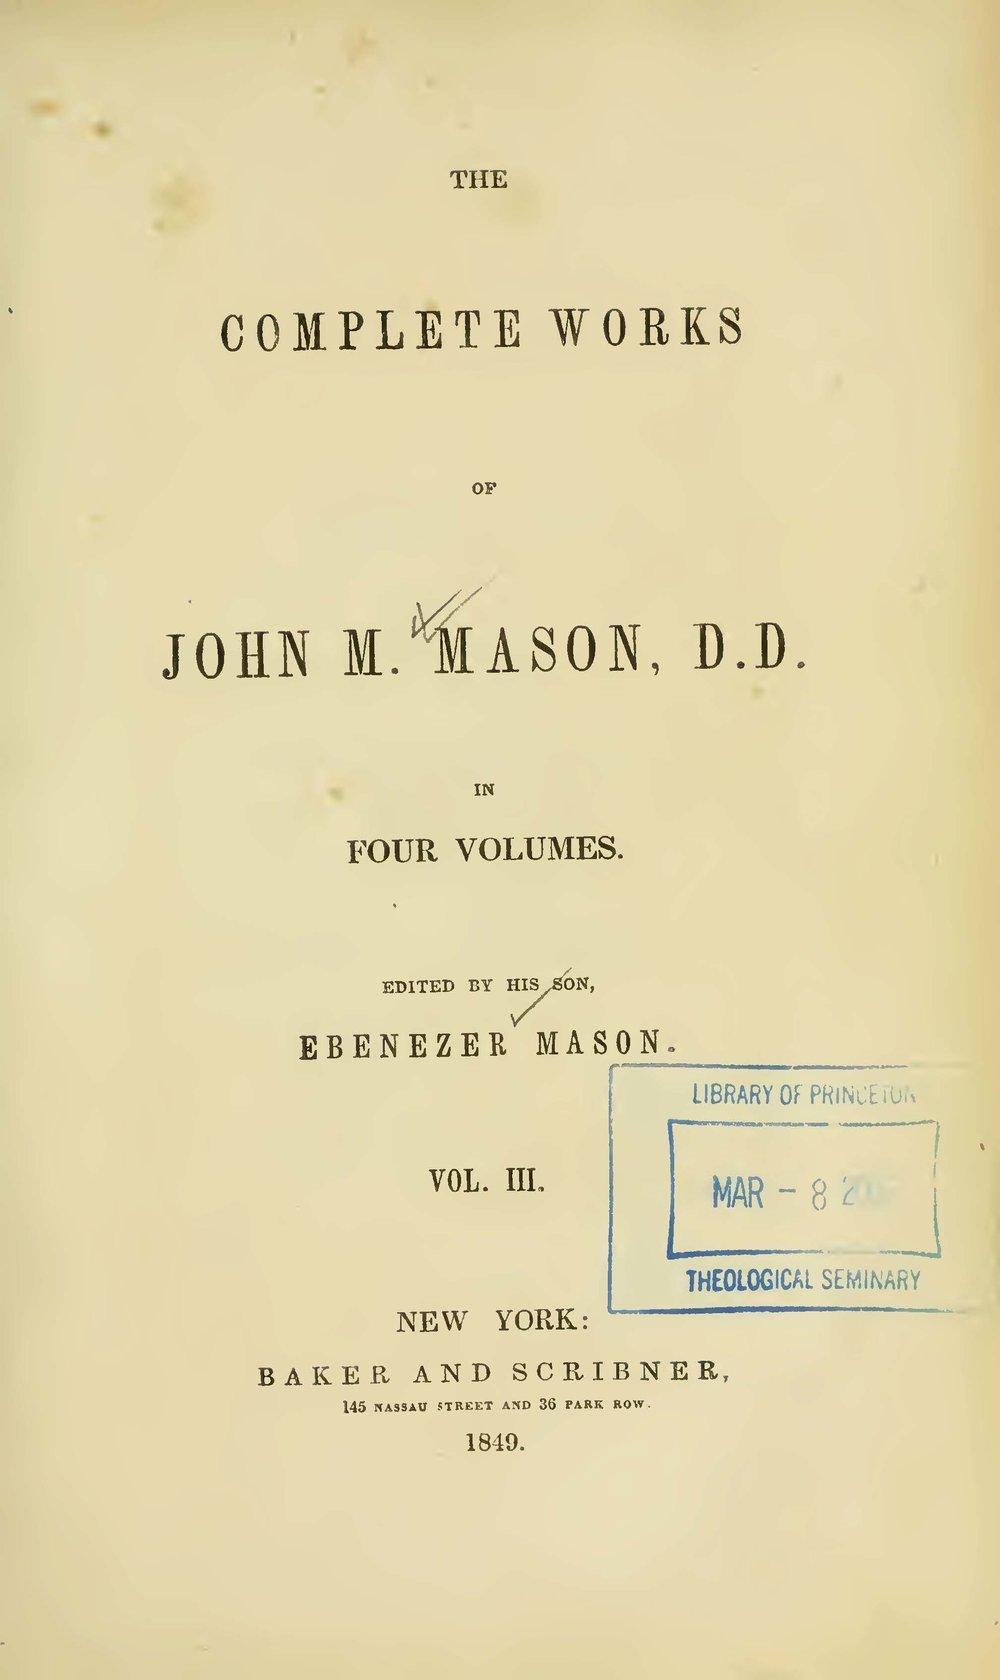 Mason, John Mitchell, The Complete Works of John M. Mason, D.D., Vol. 3 Title Page.jpg